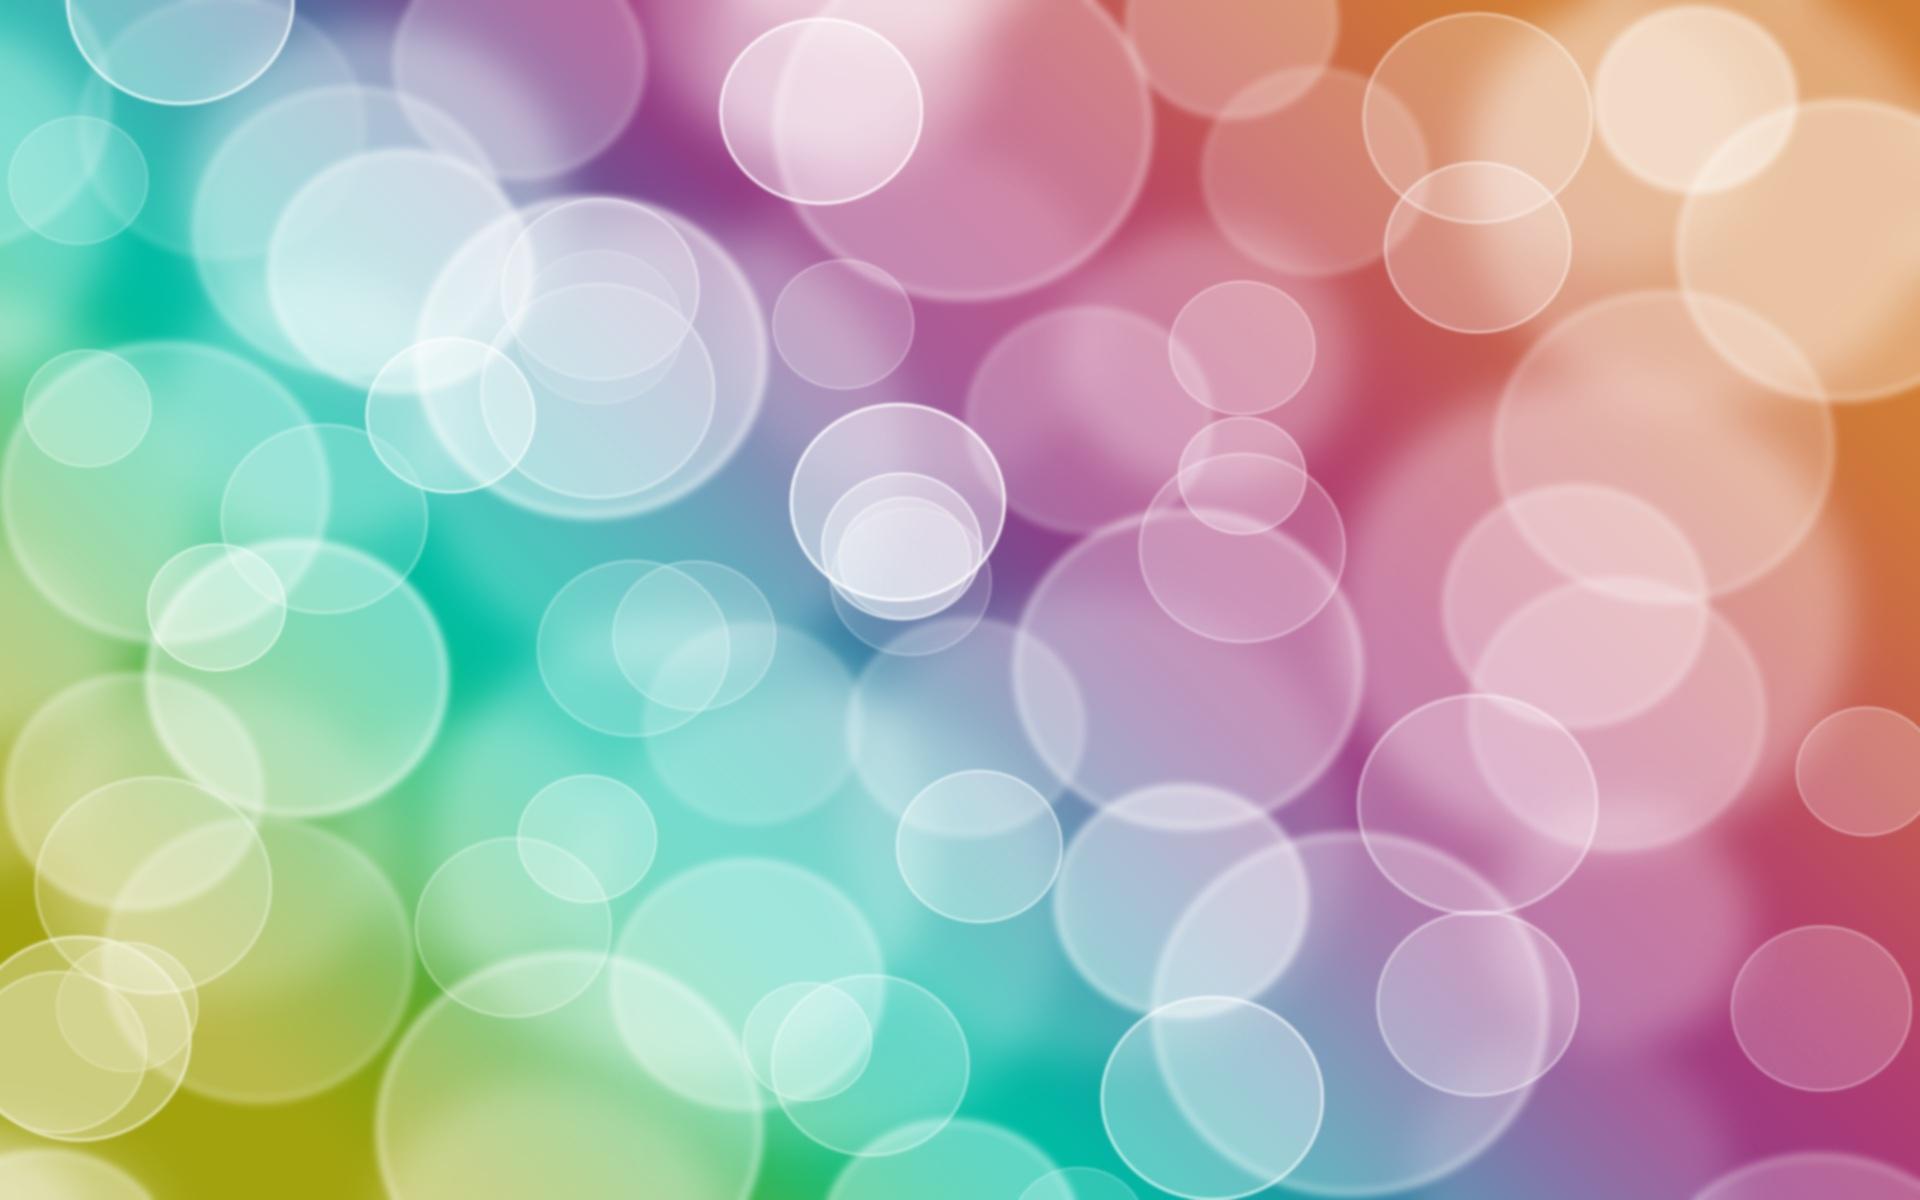 colorful animal print desktop backgrounds